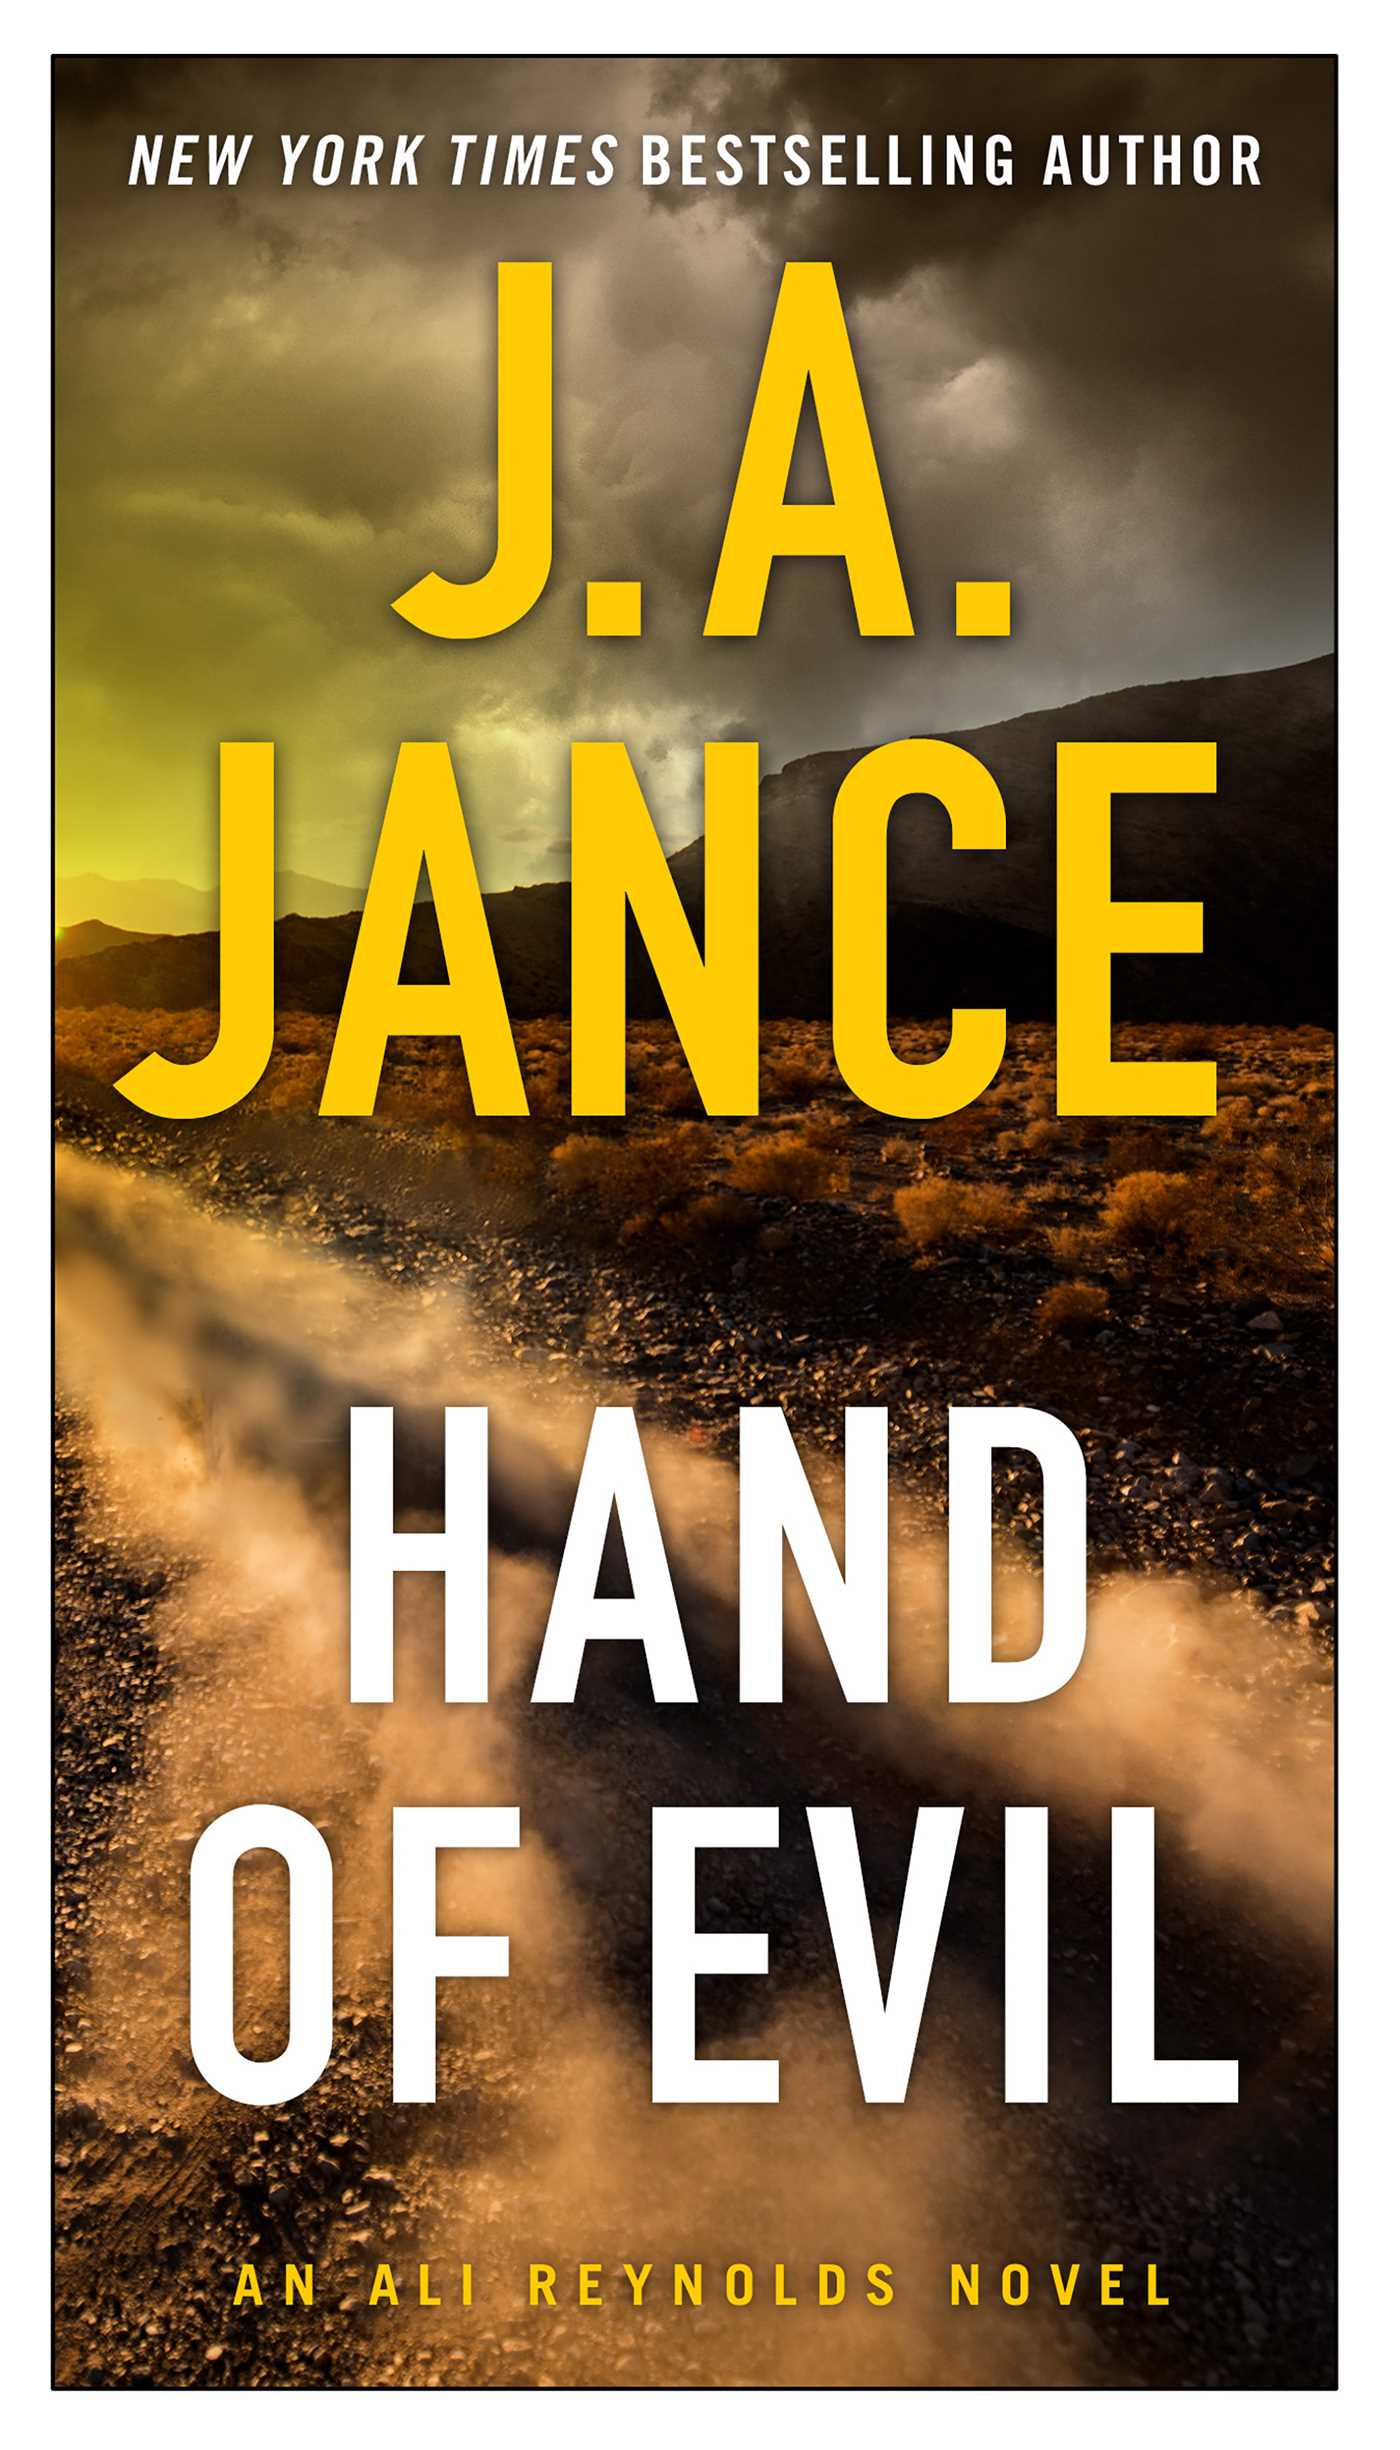 Hand of evil 9781416554608 hr